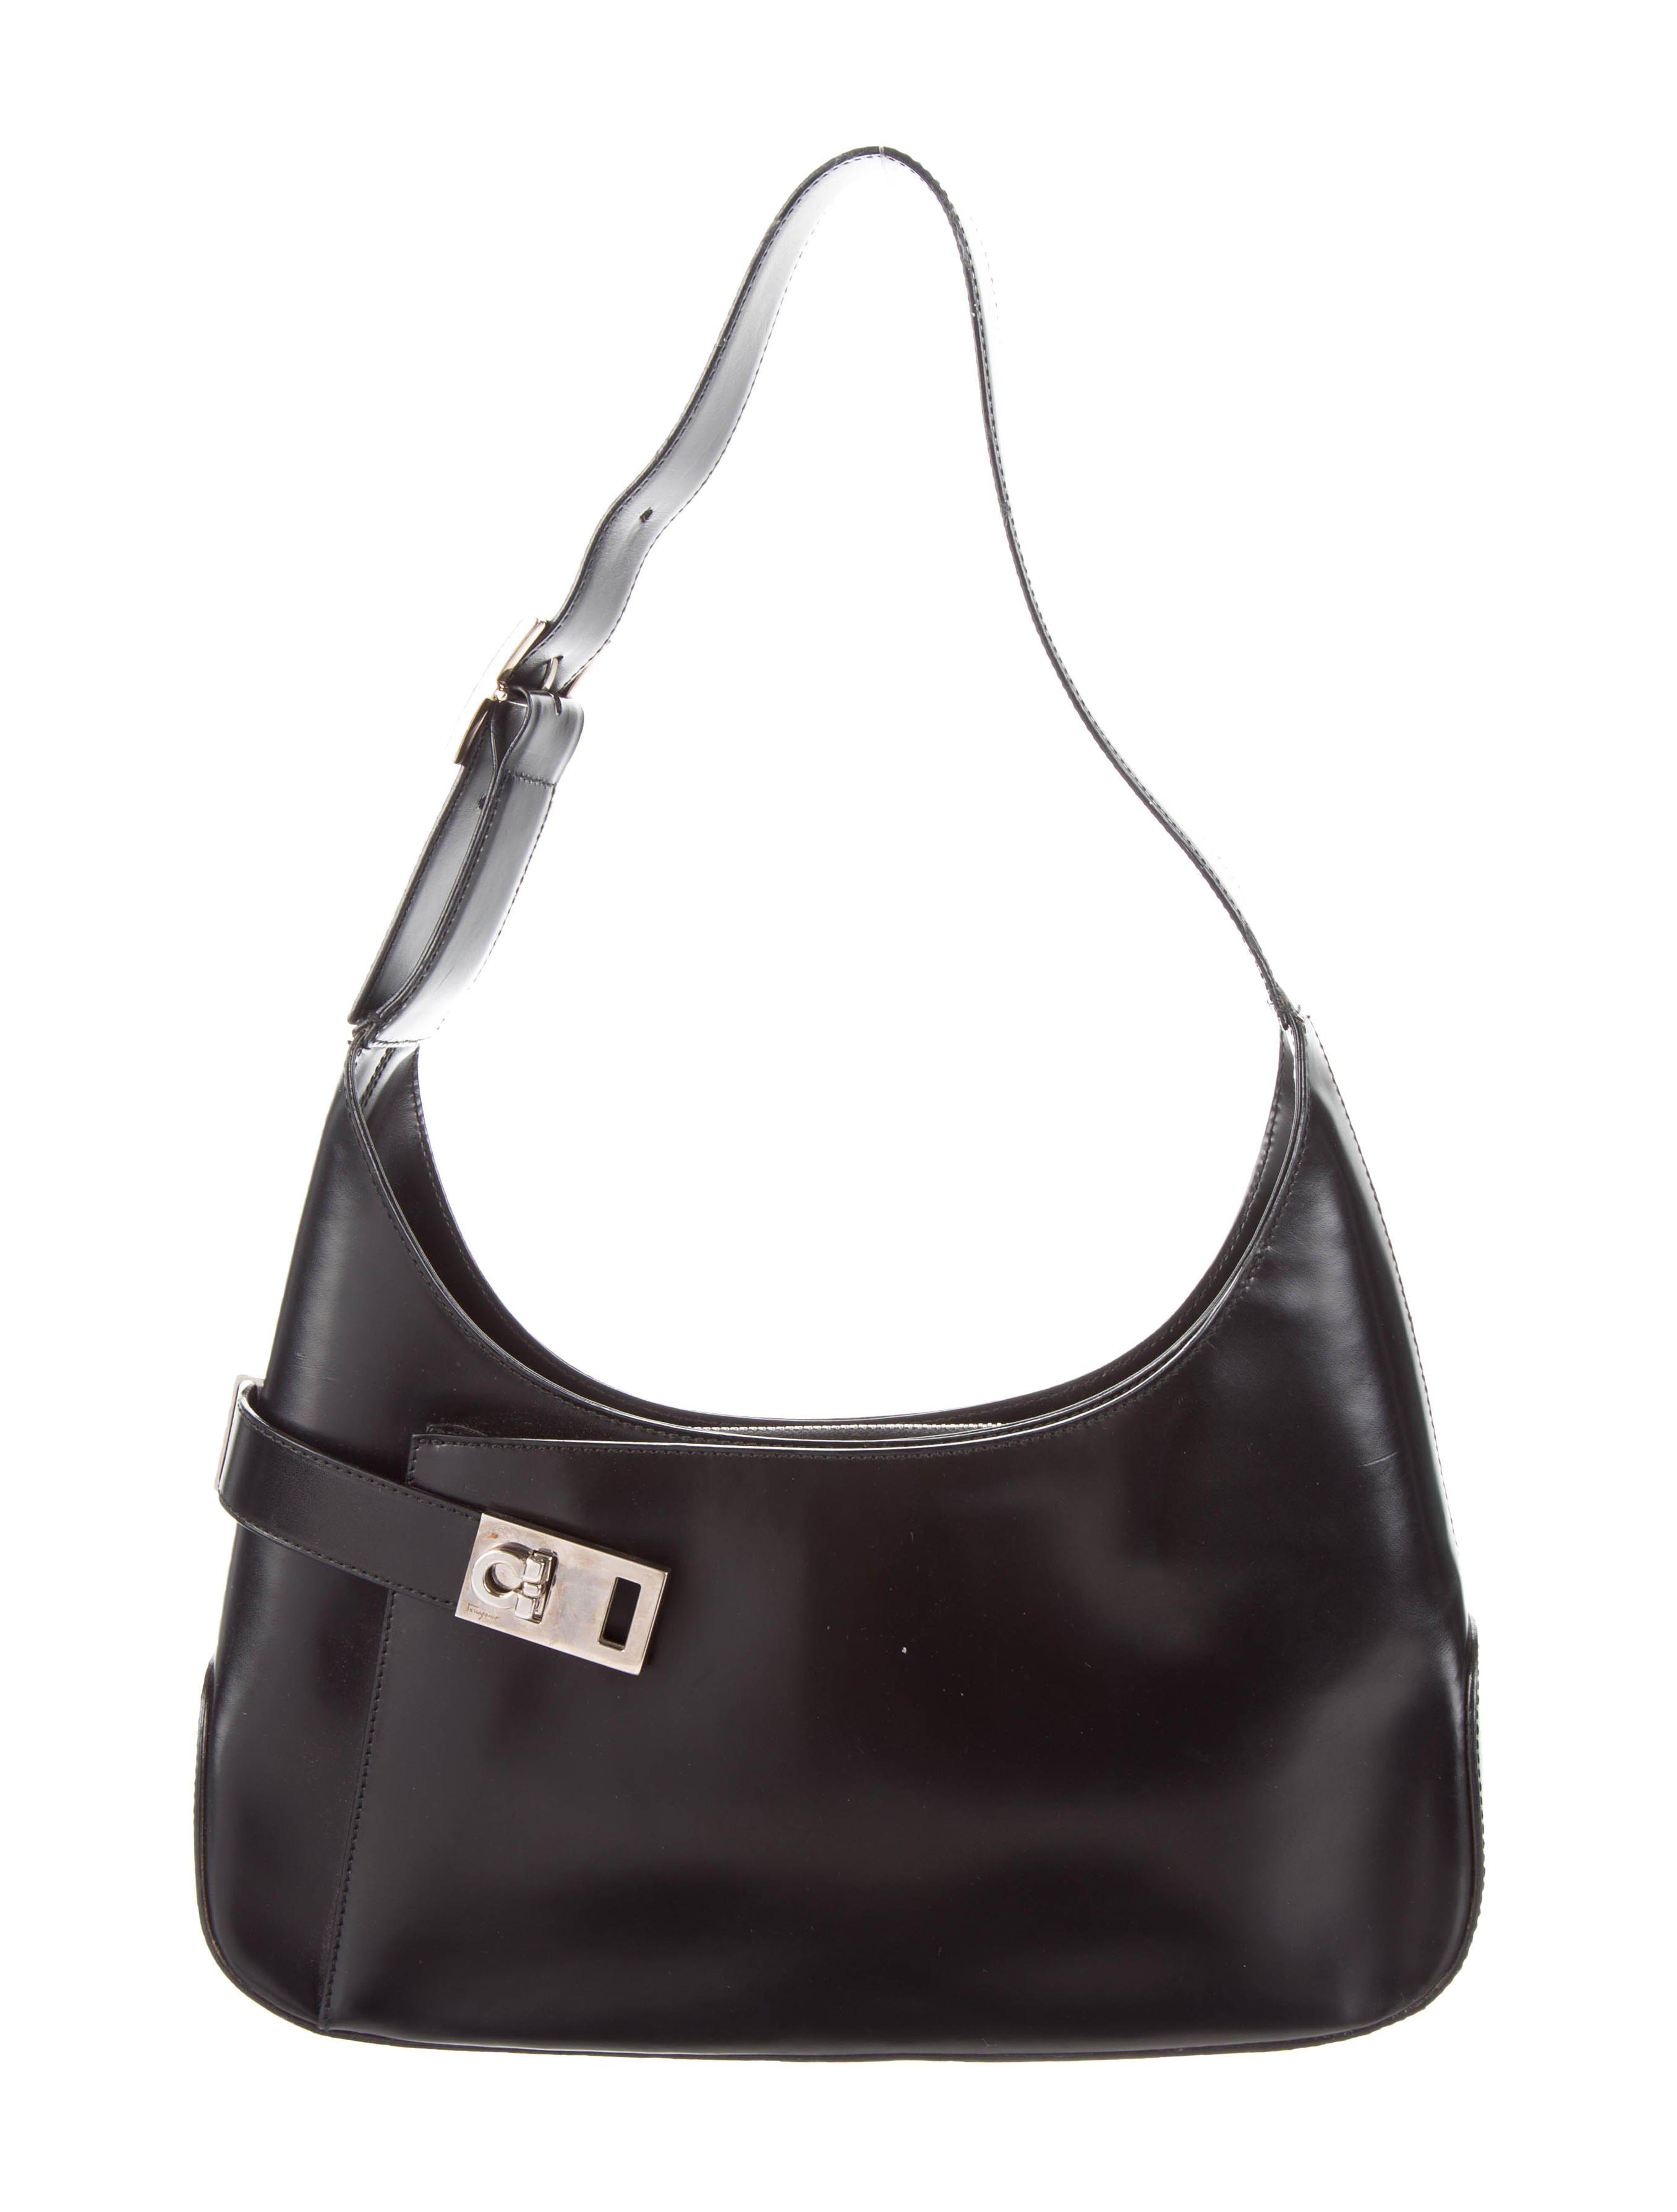 Lyst - Ferragamo Leather Gancini Hobo Black in Metallic 9d5fc2fde8ae9